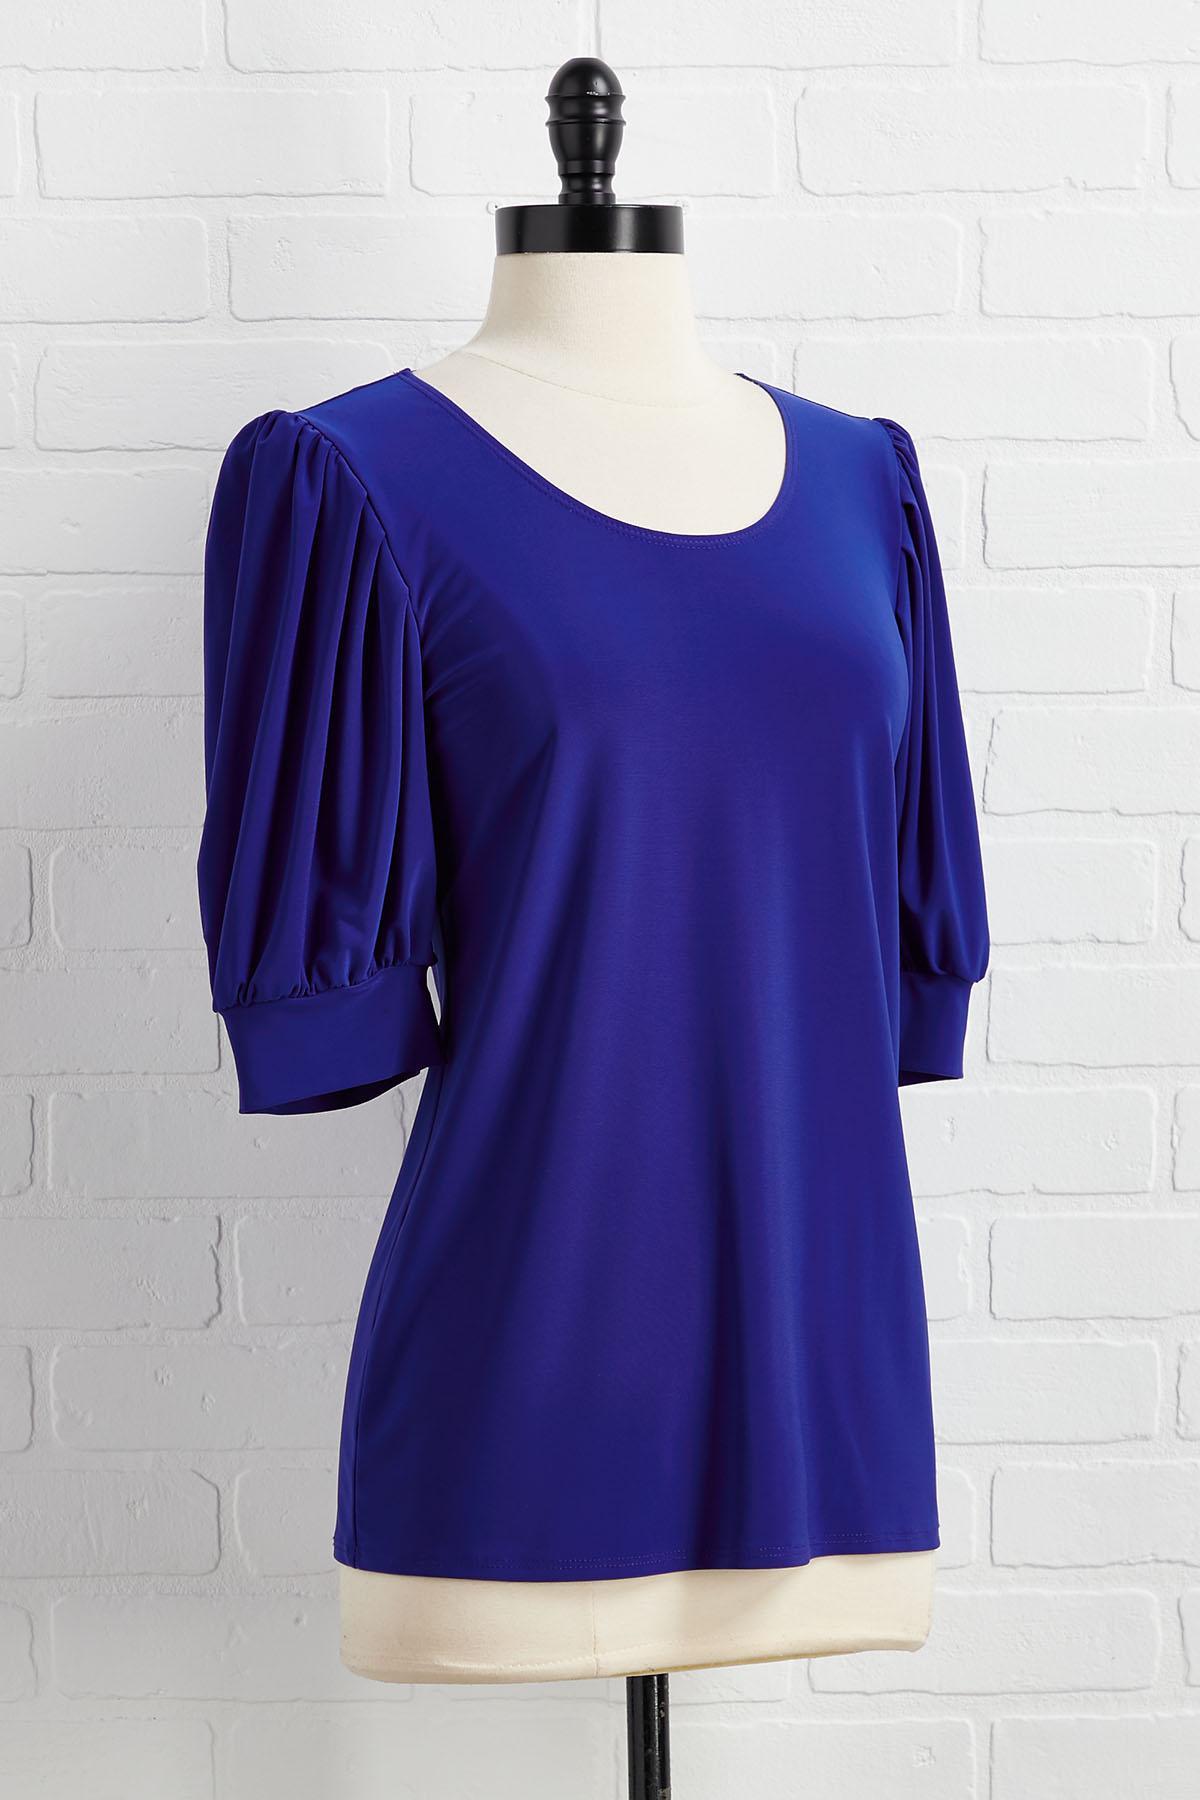 Blue Sleeve Baby Top